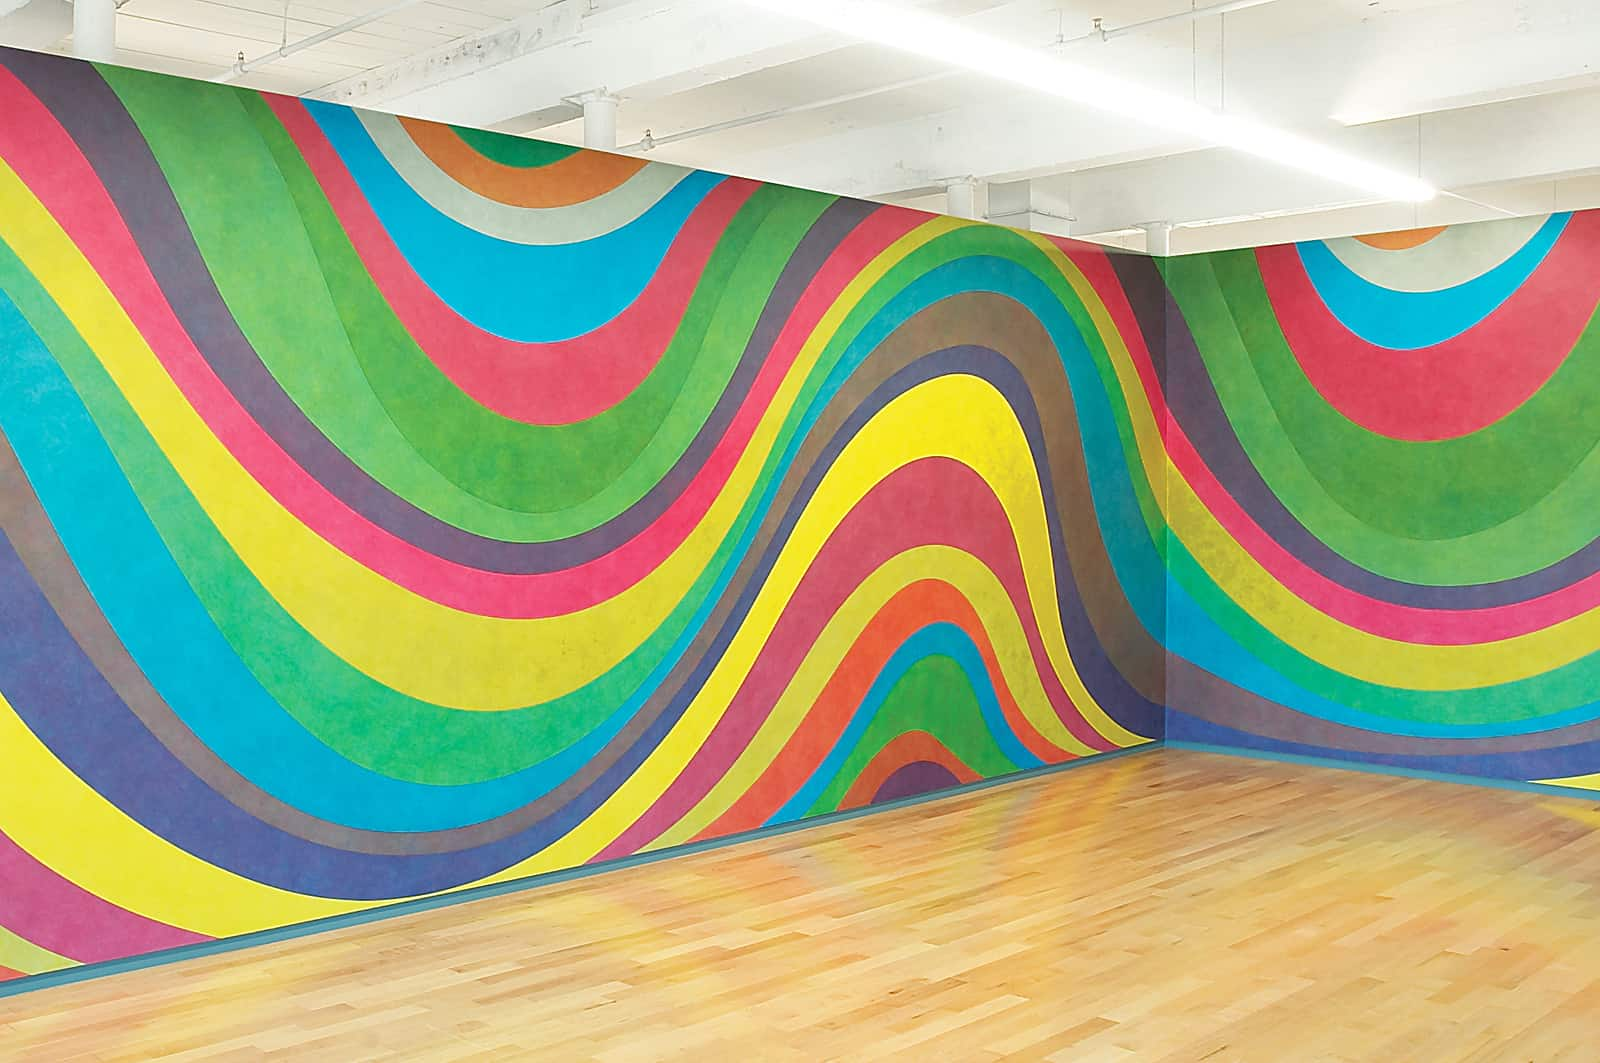 Sol LeWitt: Wall Drawing #793A